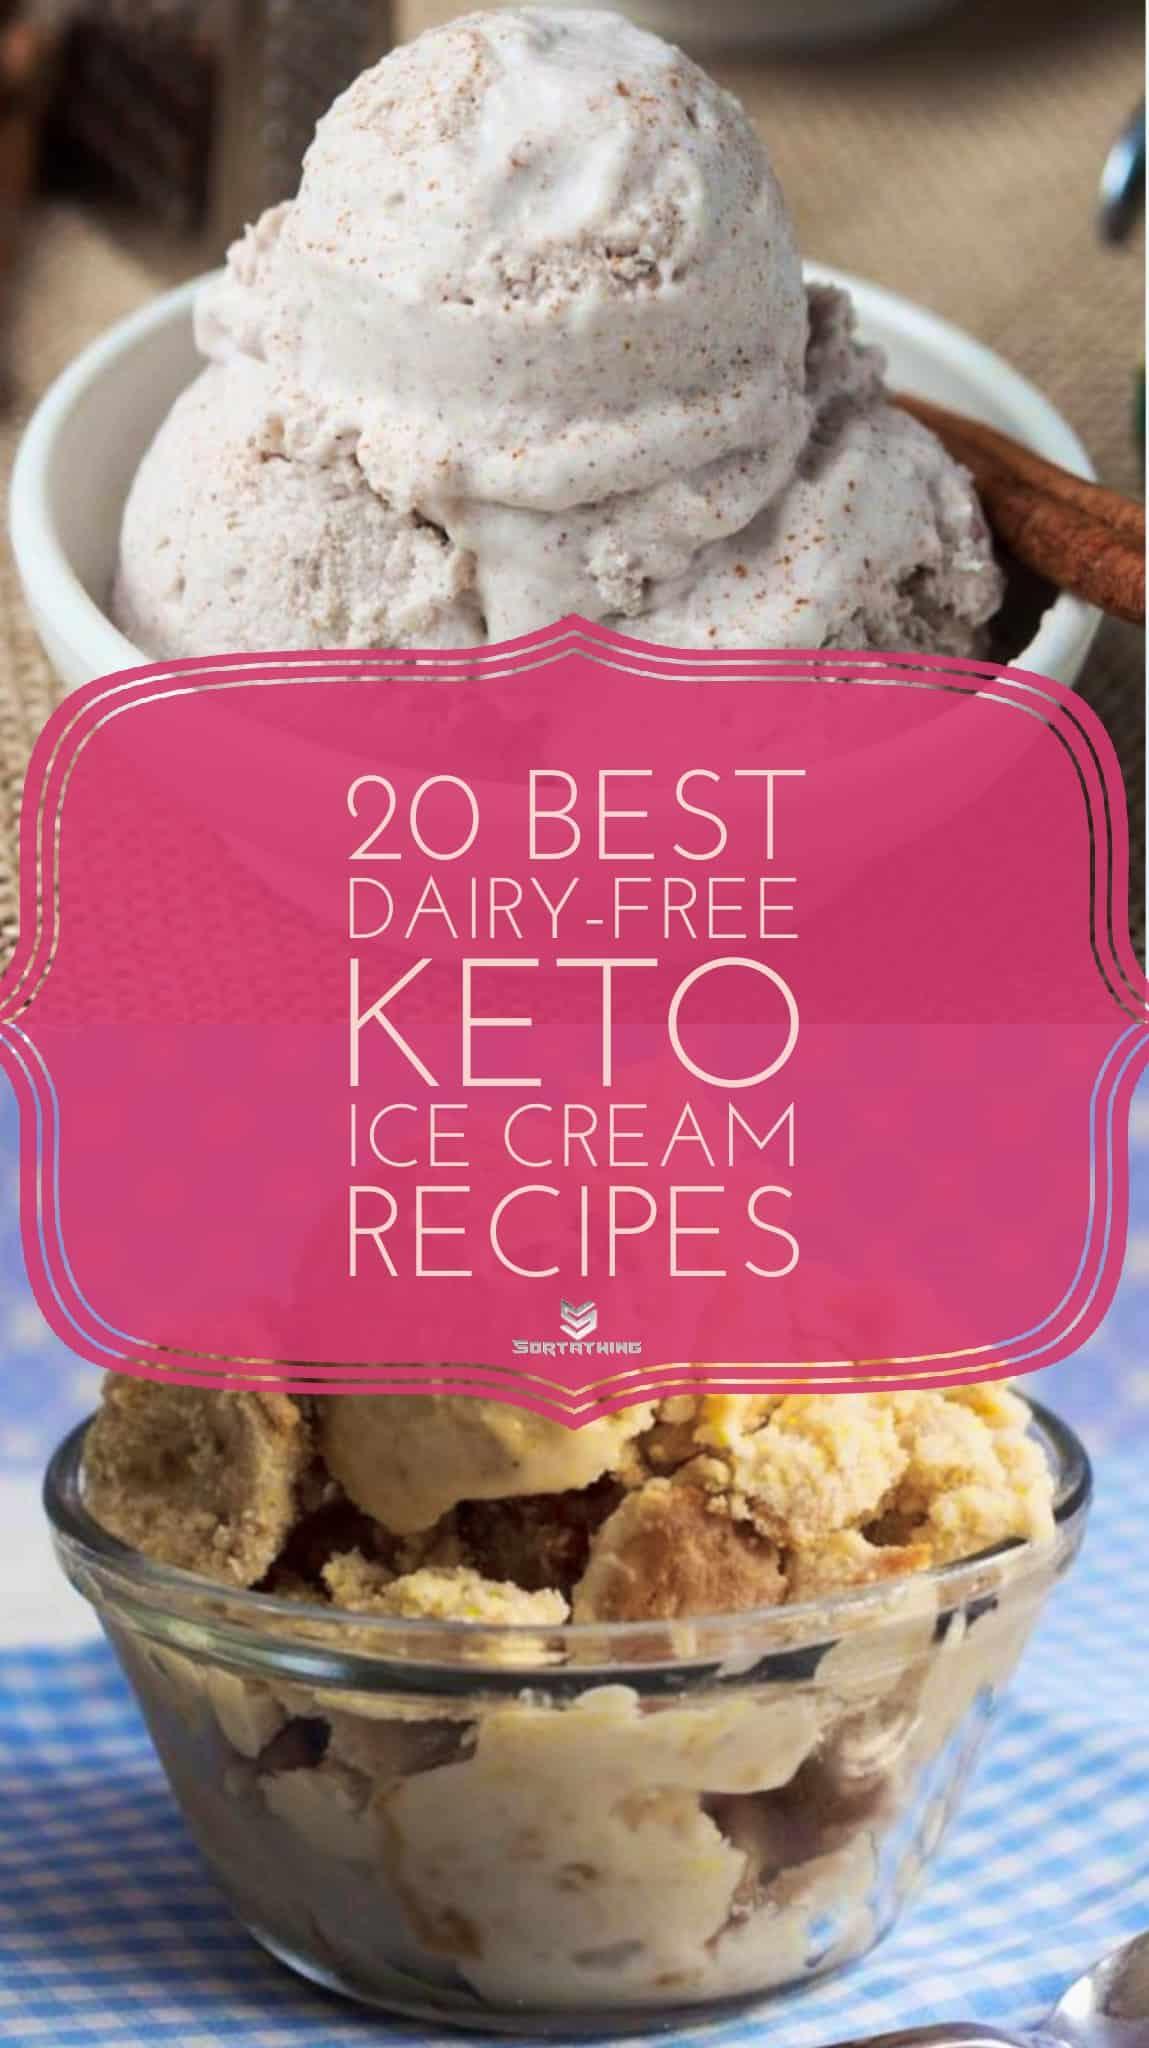 Keto Dairy-Free Cinnamon Ice Cream and Peanut Butter Swirl Ice Cream